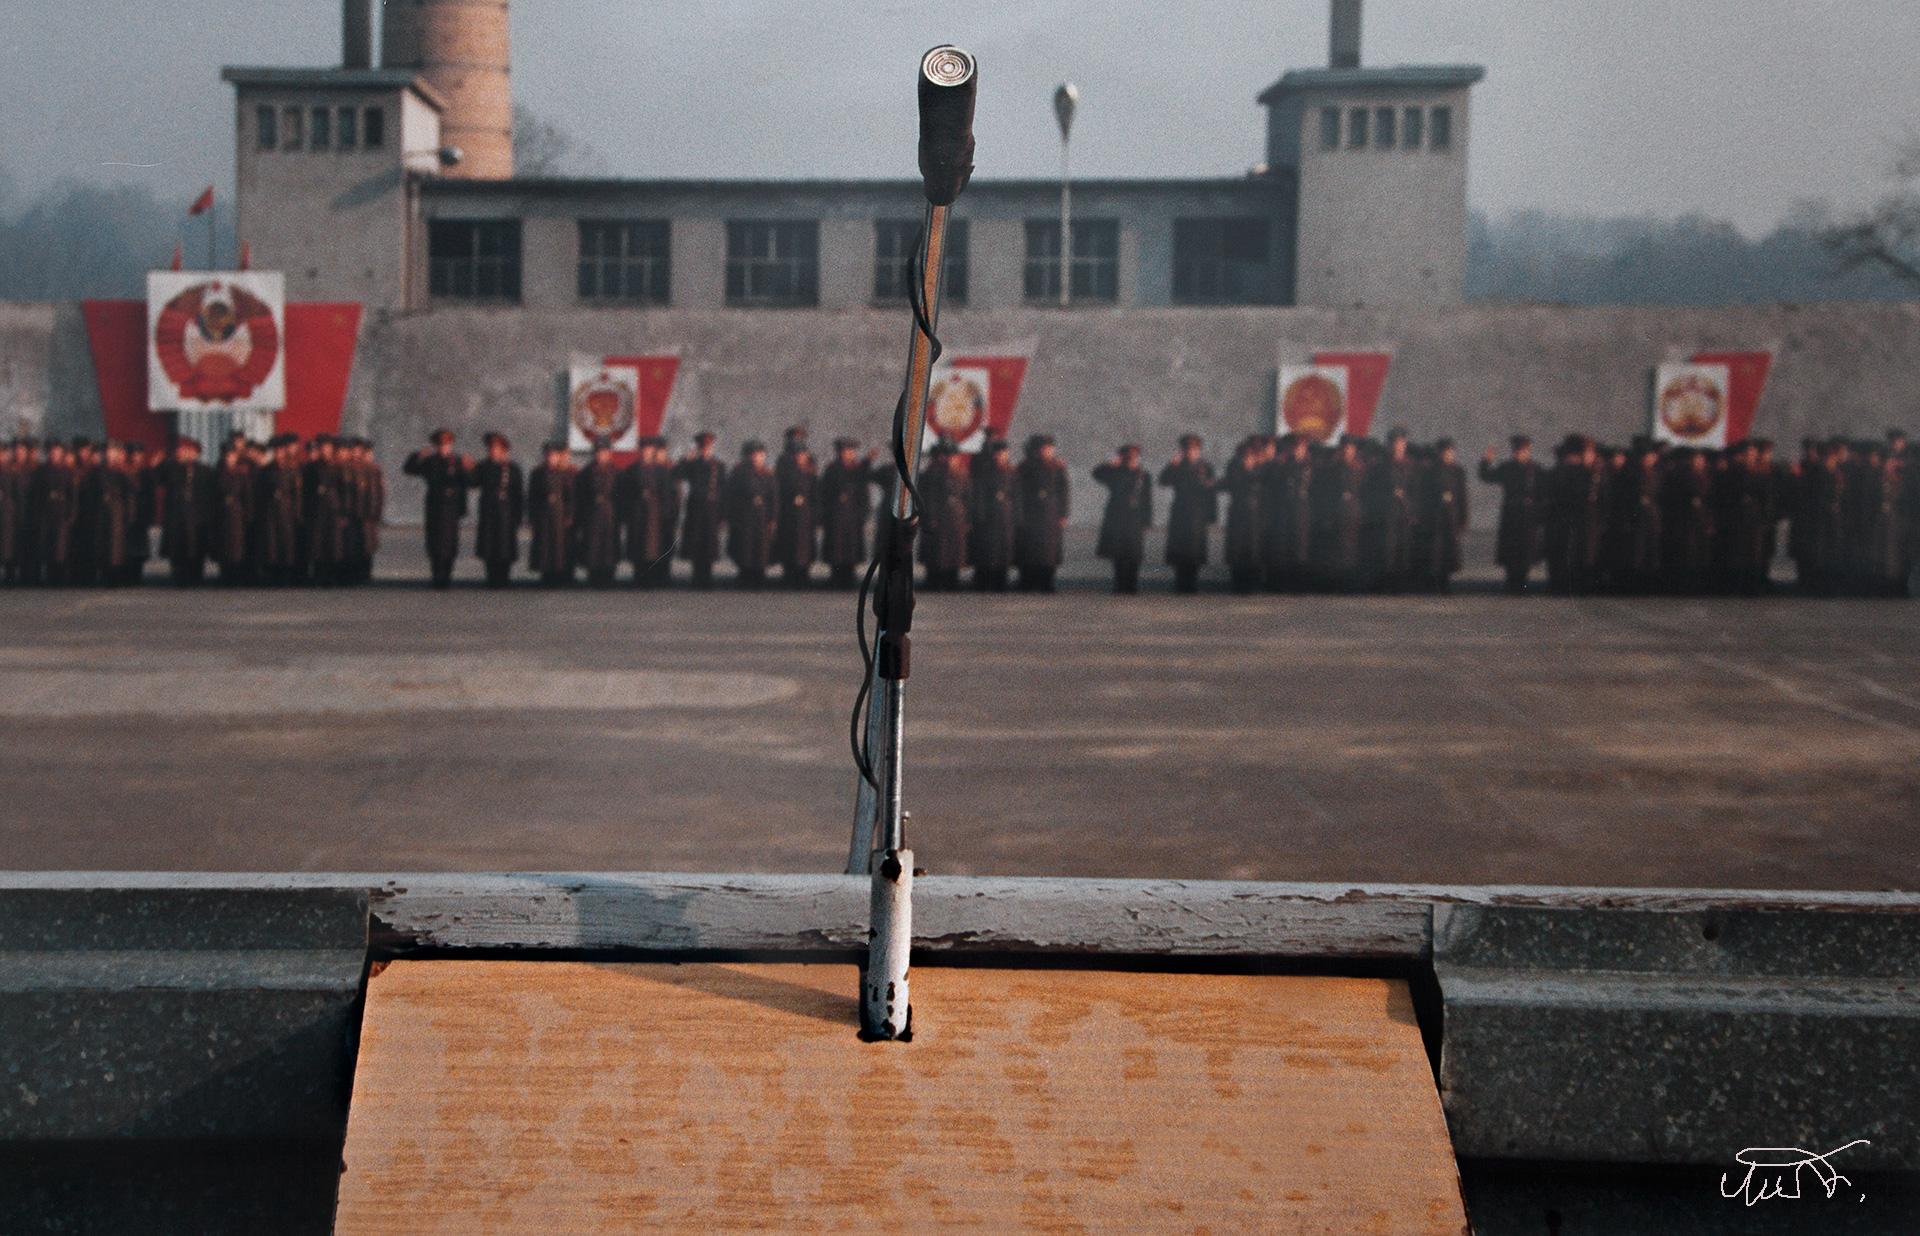 Panzerdivision Krampnitzz